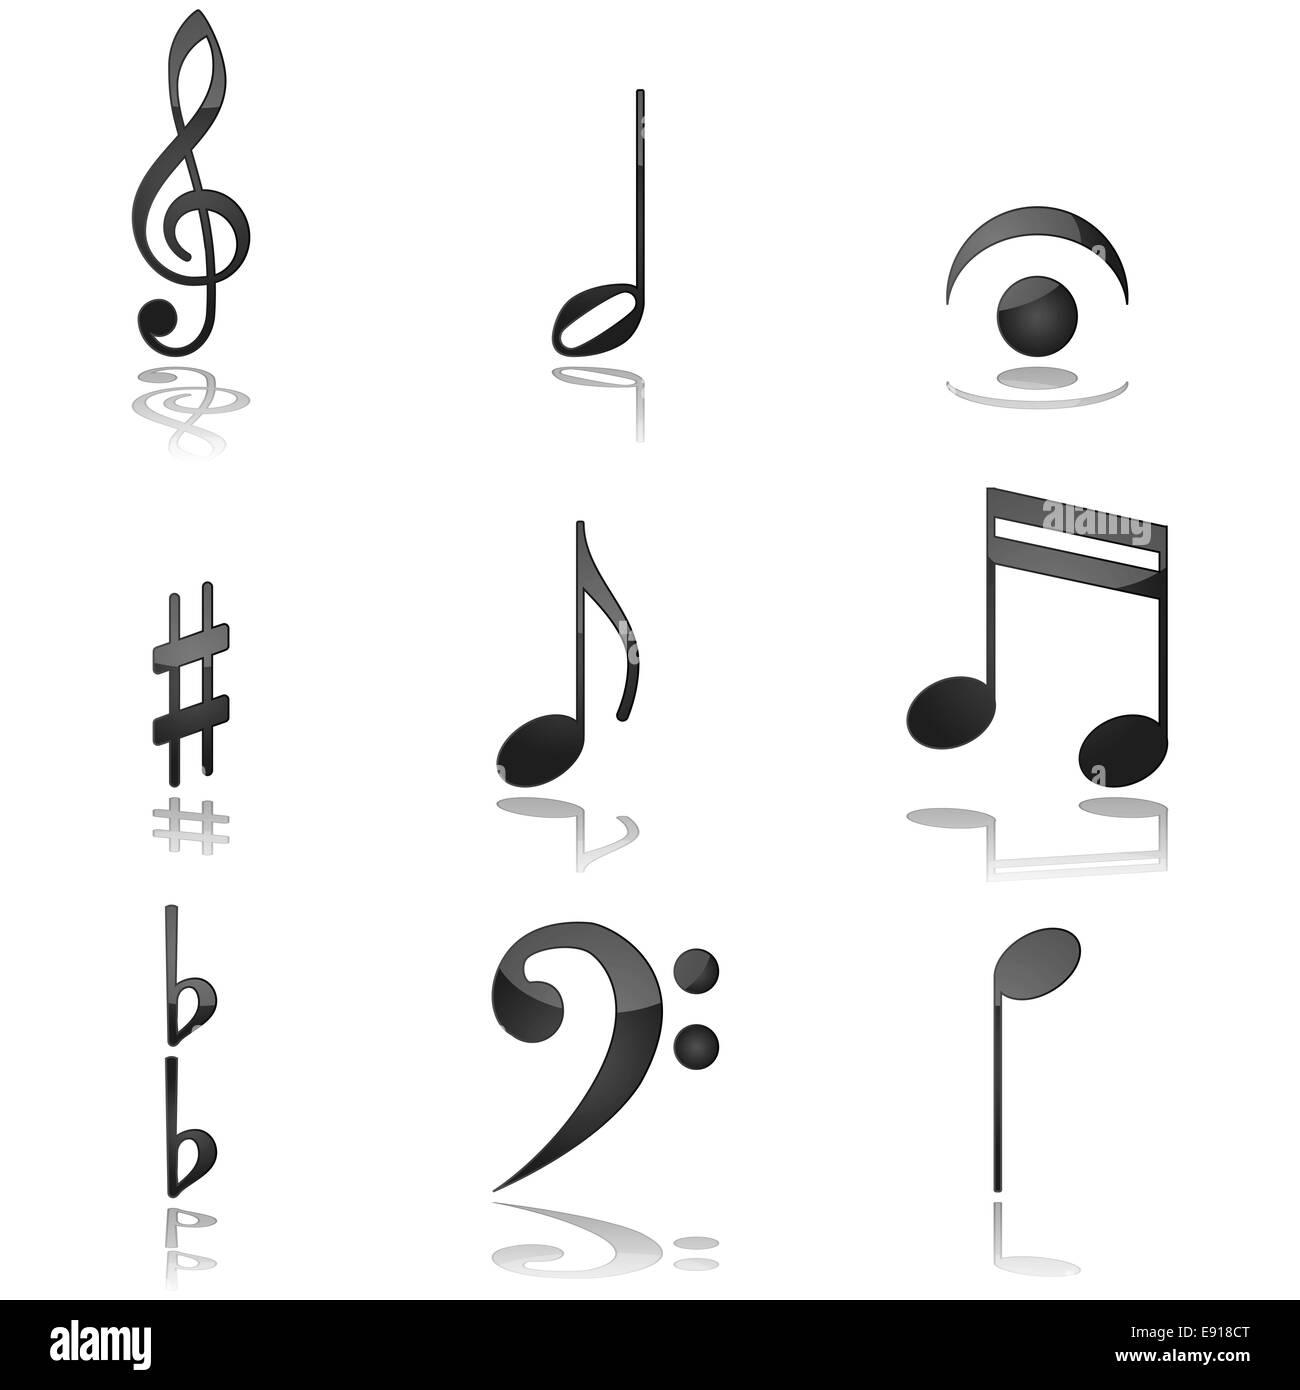 Maestro Black and White Stock Photos & Images - Alamy